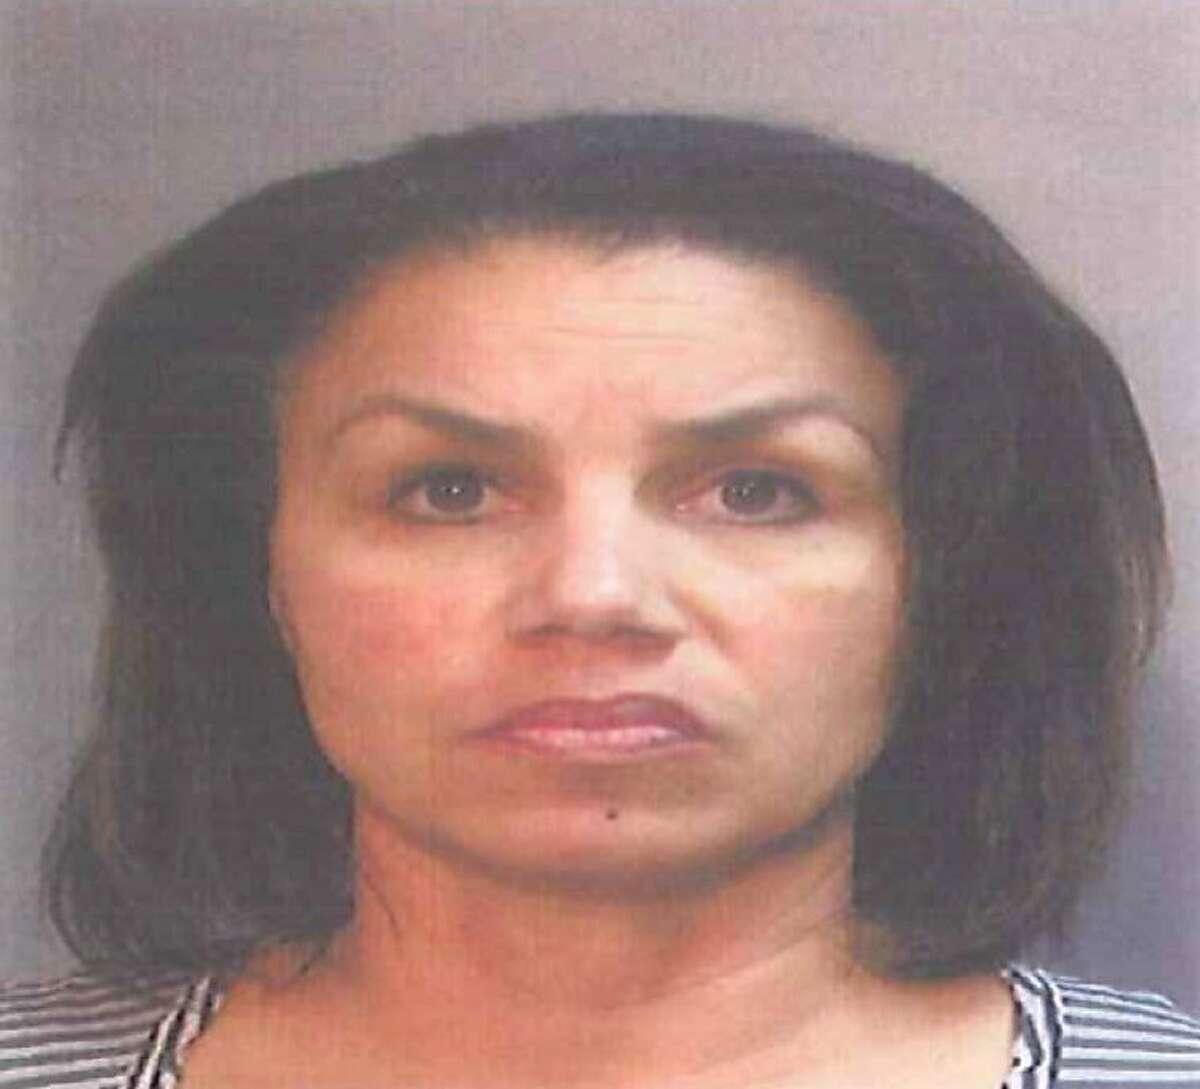 Teresa Gilmete Badger, a teacher in Benicia, CA who brought marijuana-laced food to a school potluck.